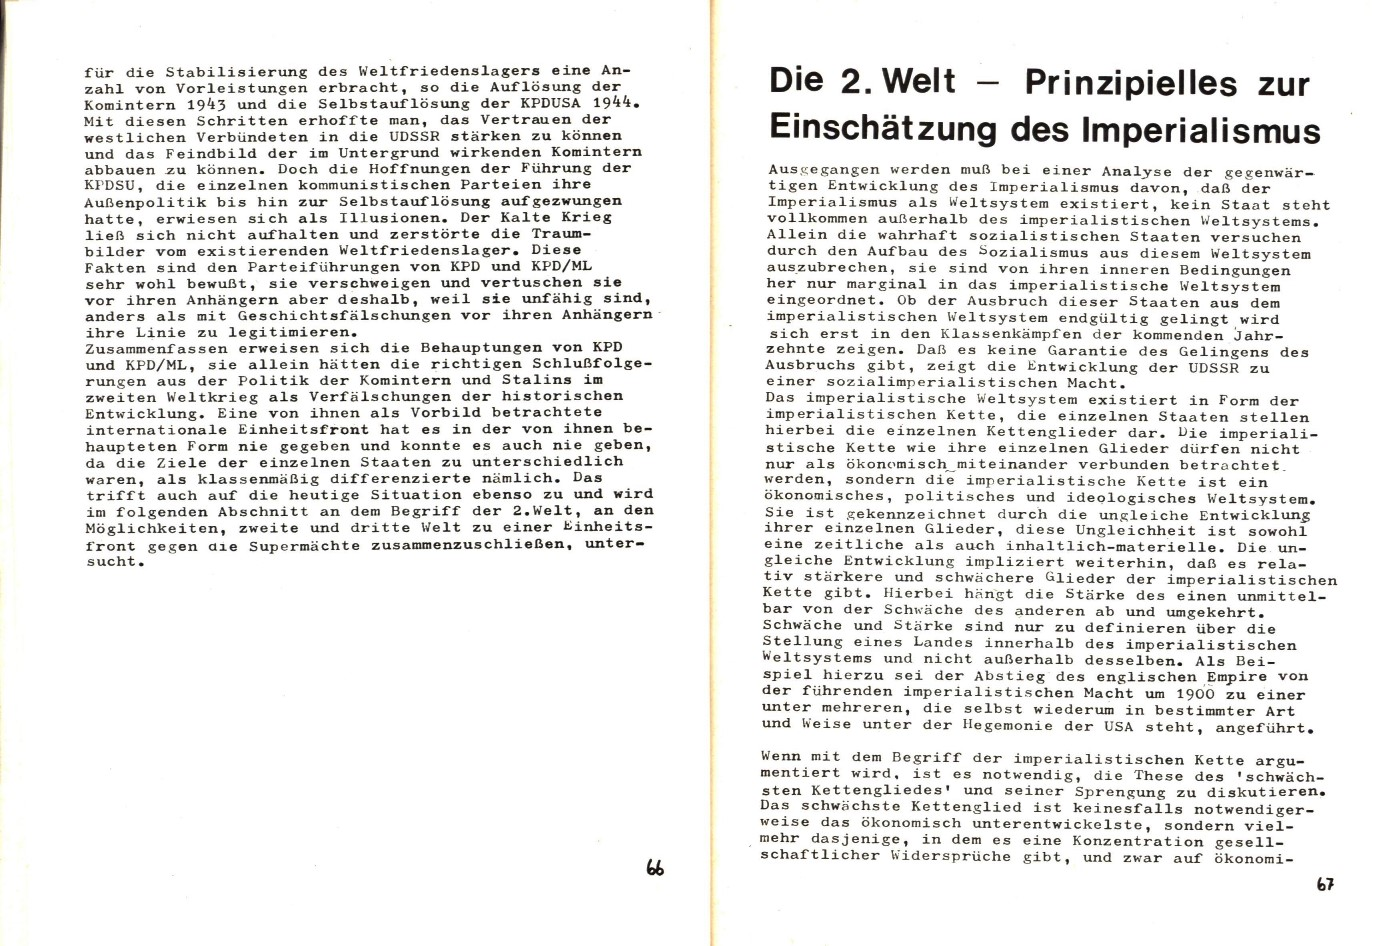 Berlin_KSV_1975_Dokumente_der_SAZ_35